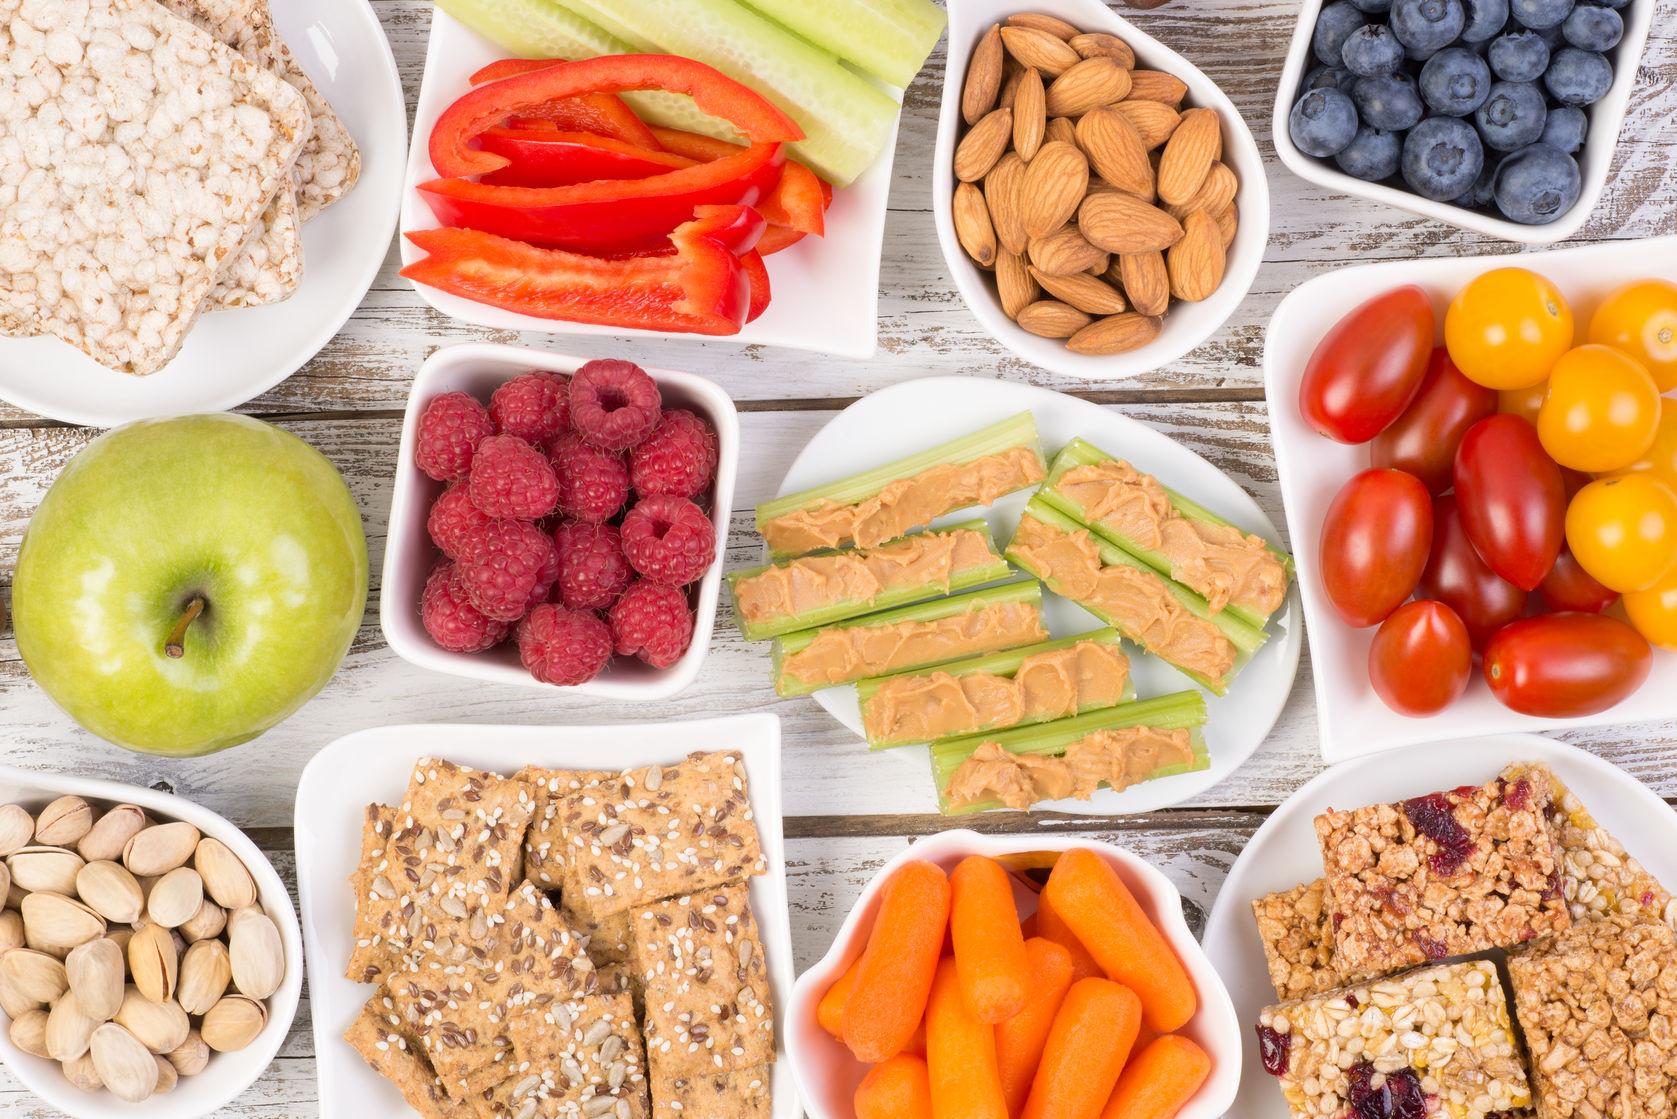 Healthy Nutritious Snacks  5 Healthy Snack Ideas That Require NO Skills